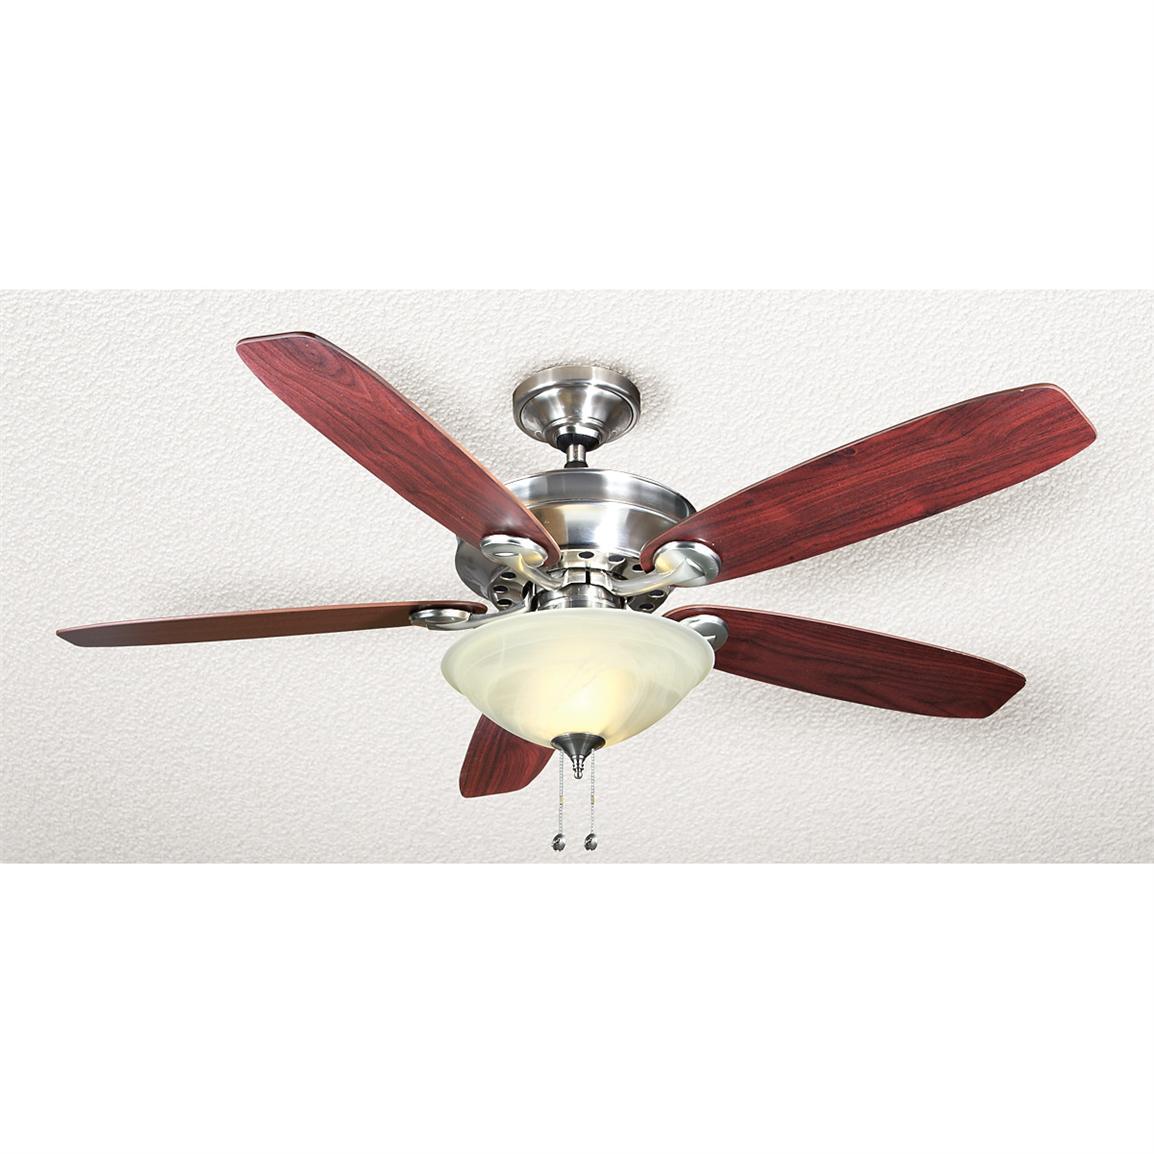 refurbished ceiling fans photo - 3